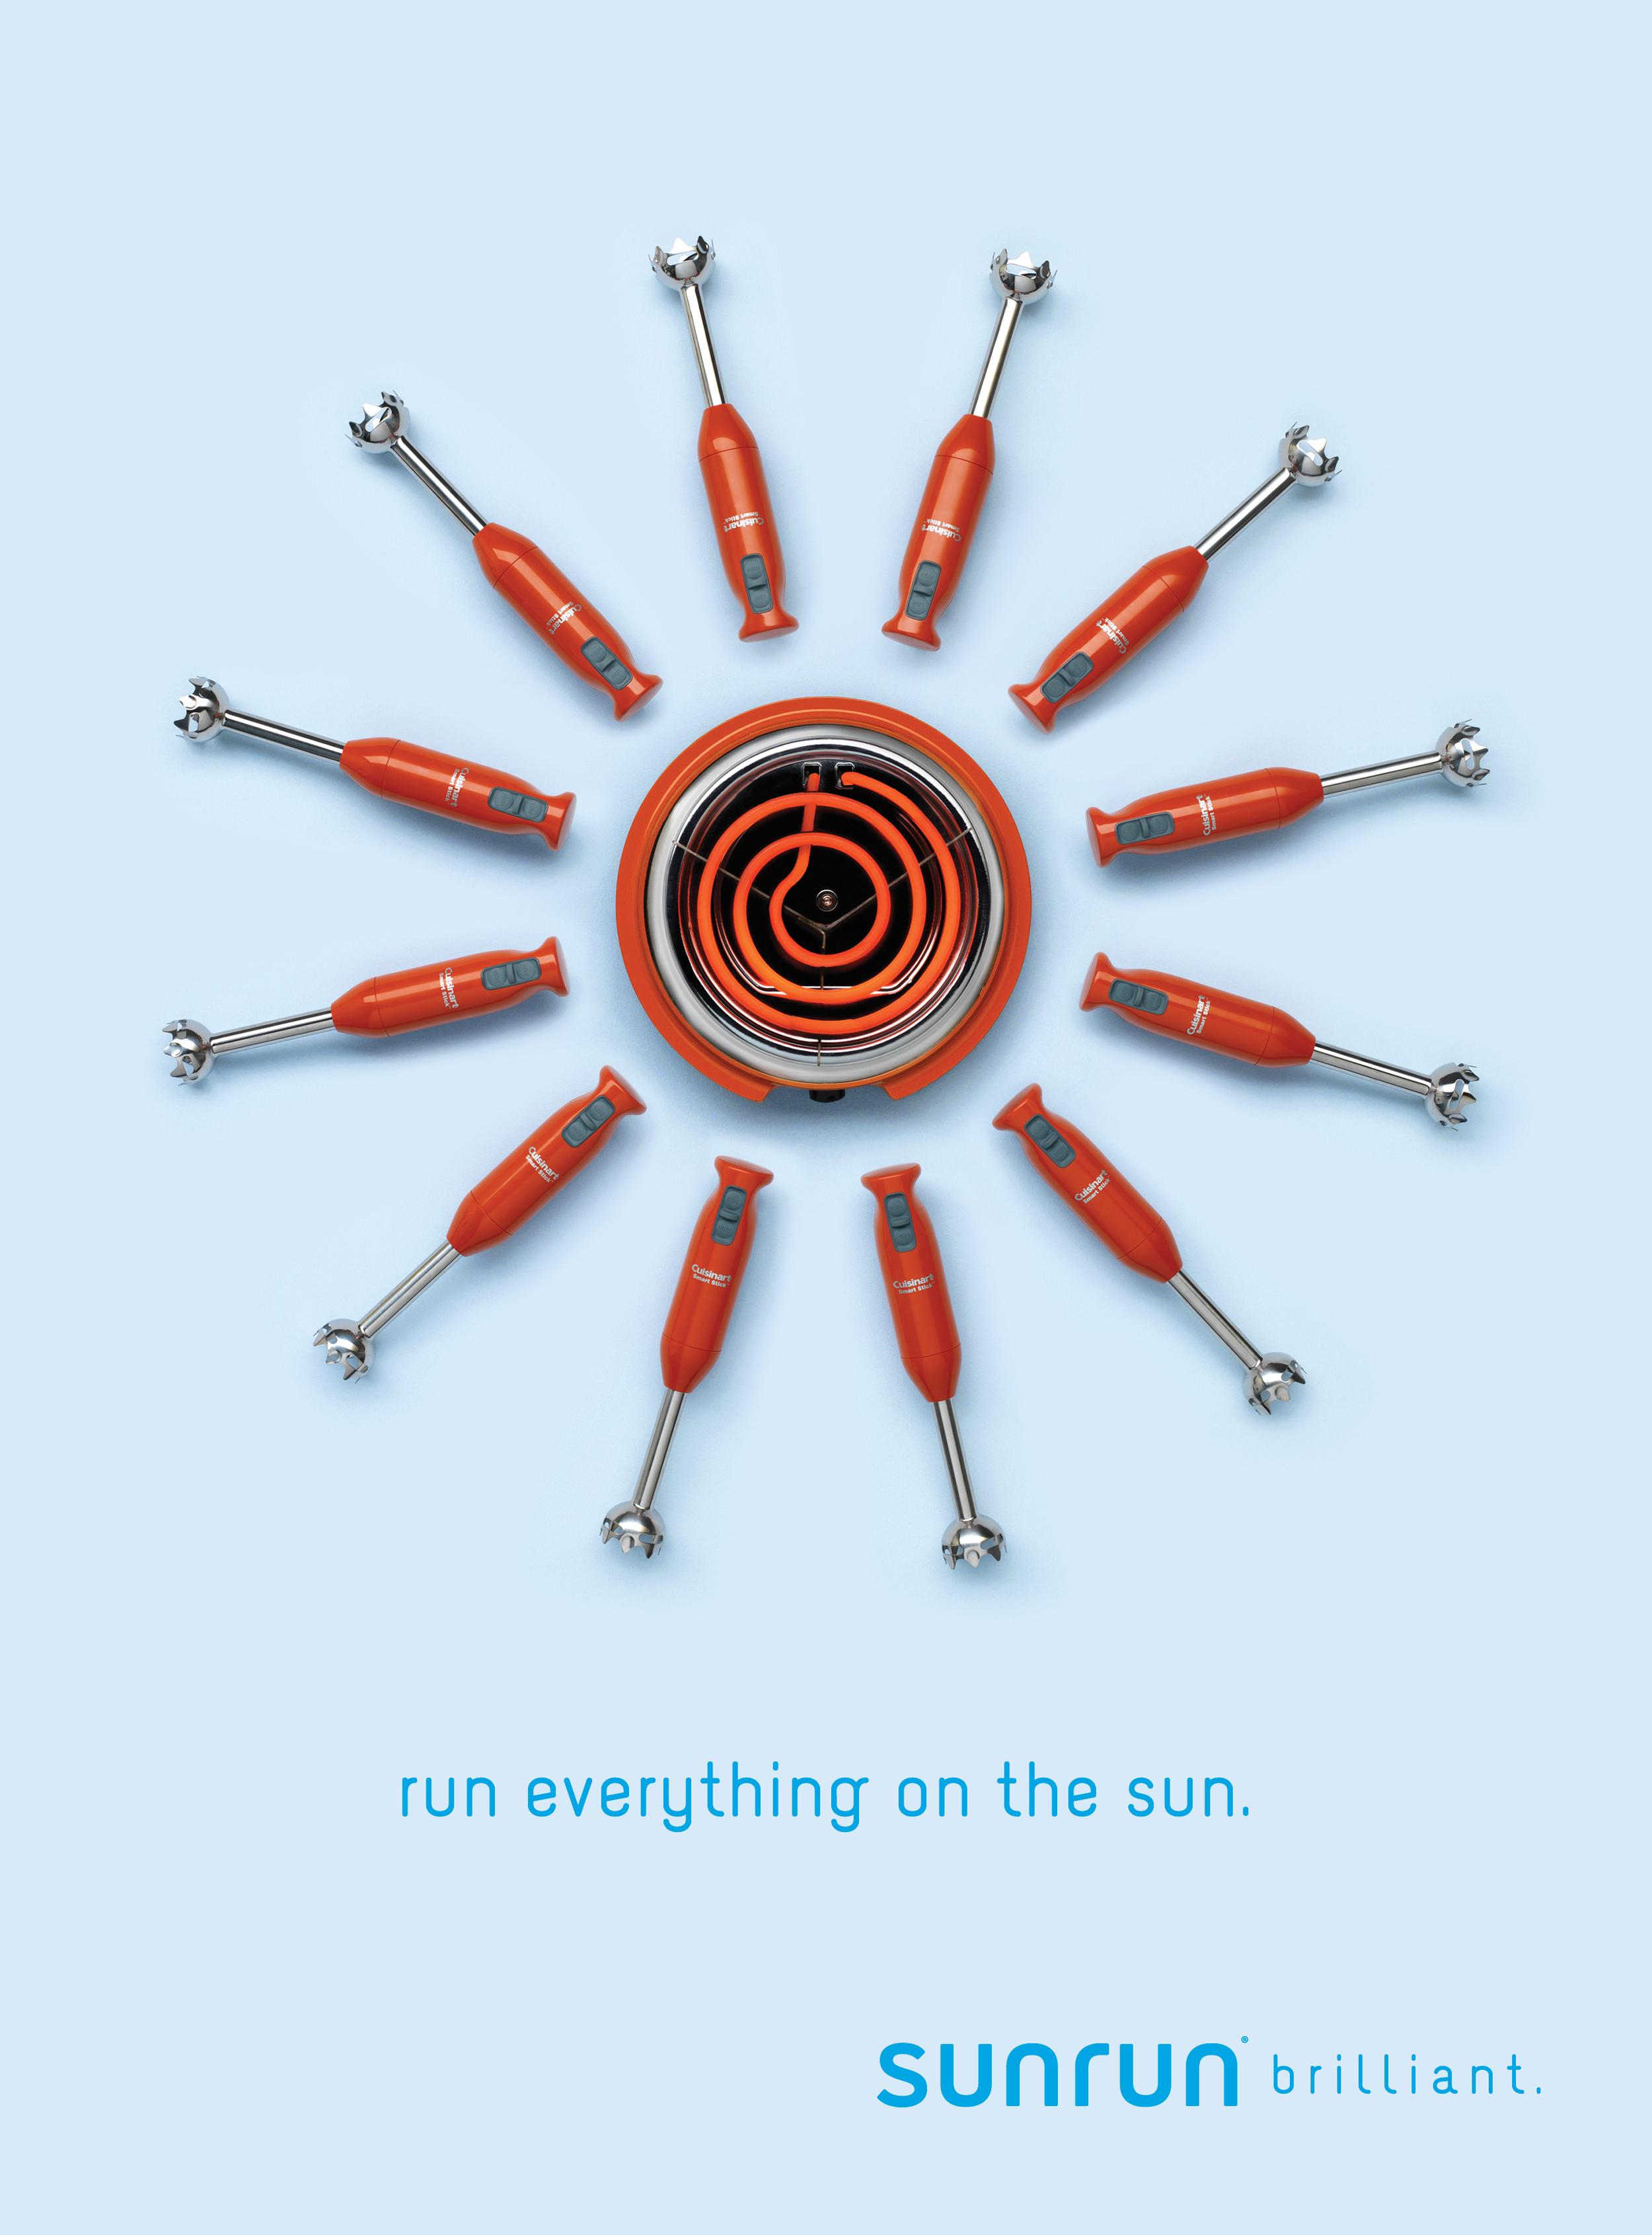 Sunrun-Brilliant-Eun-Everything-On-the-Sun-Immersion-Blender